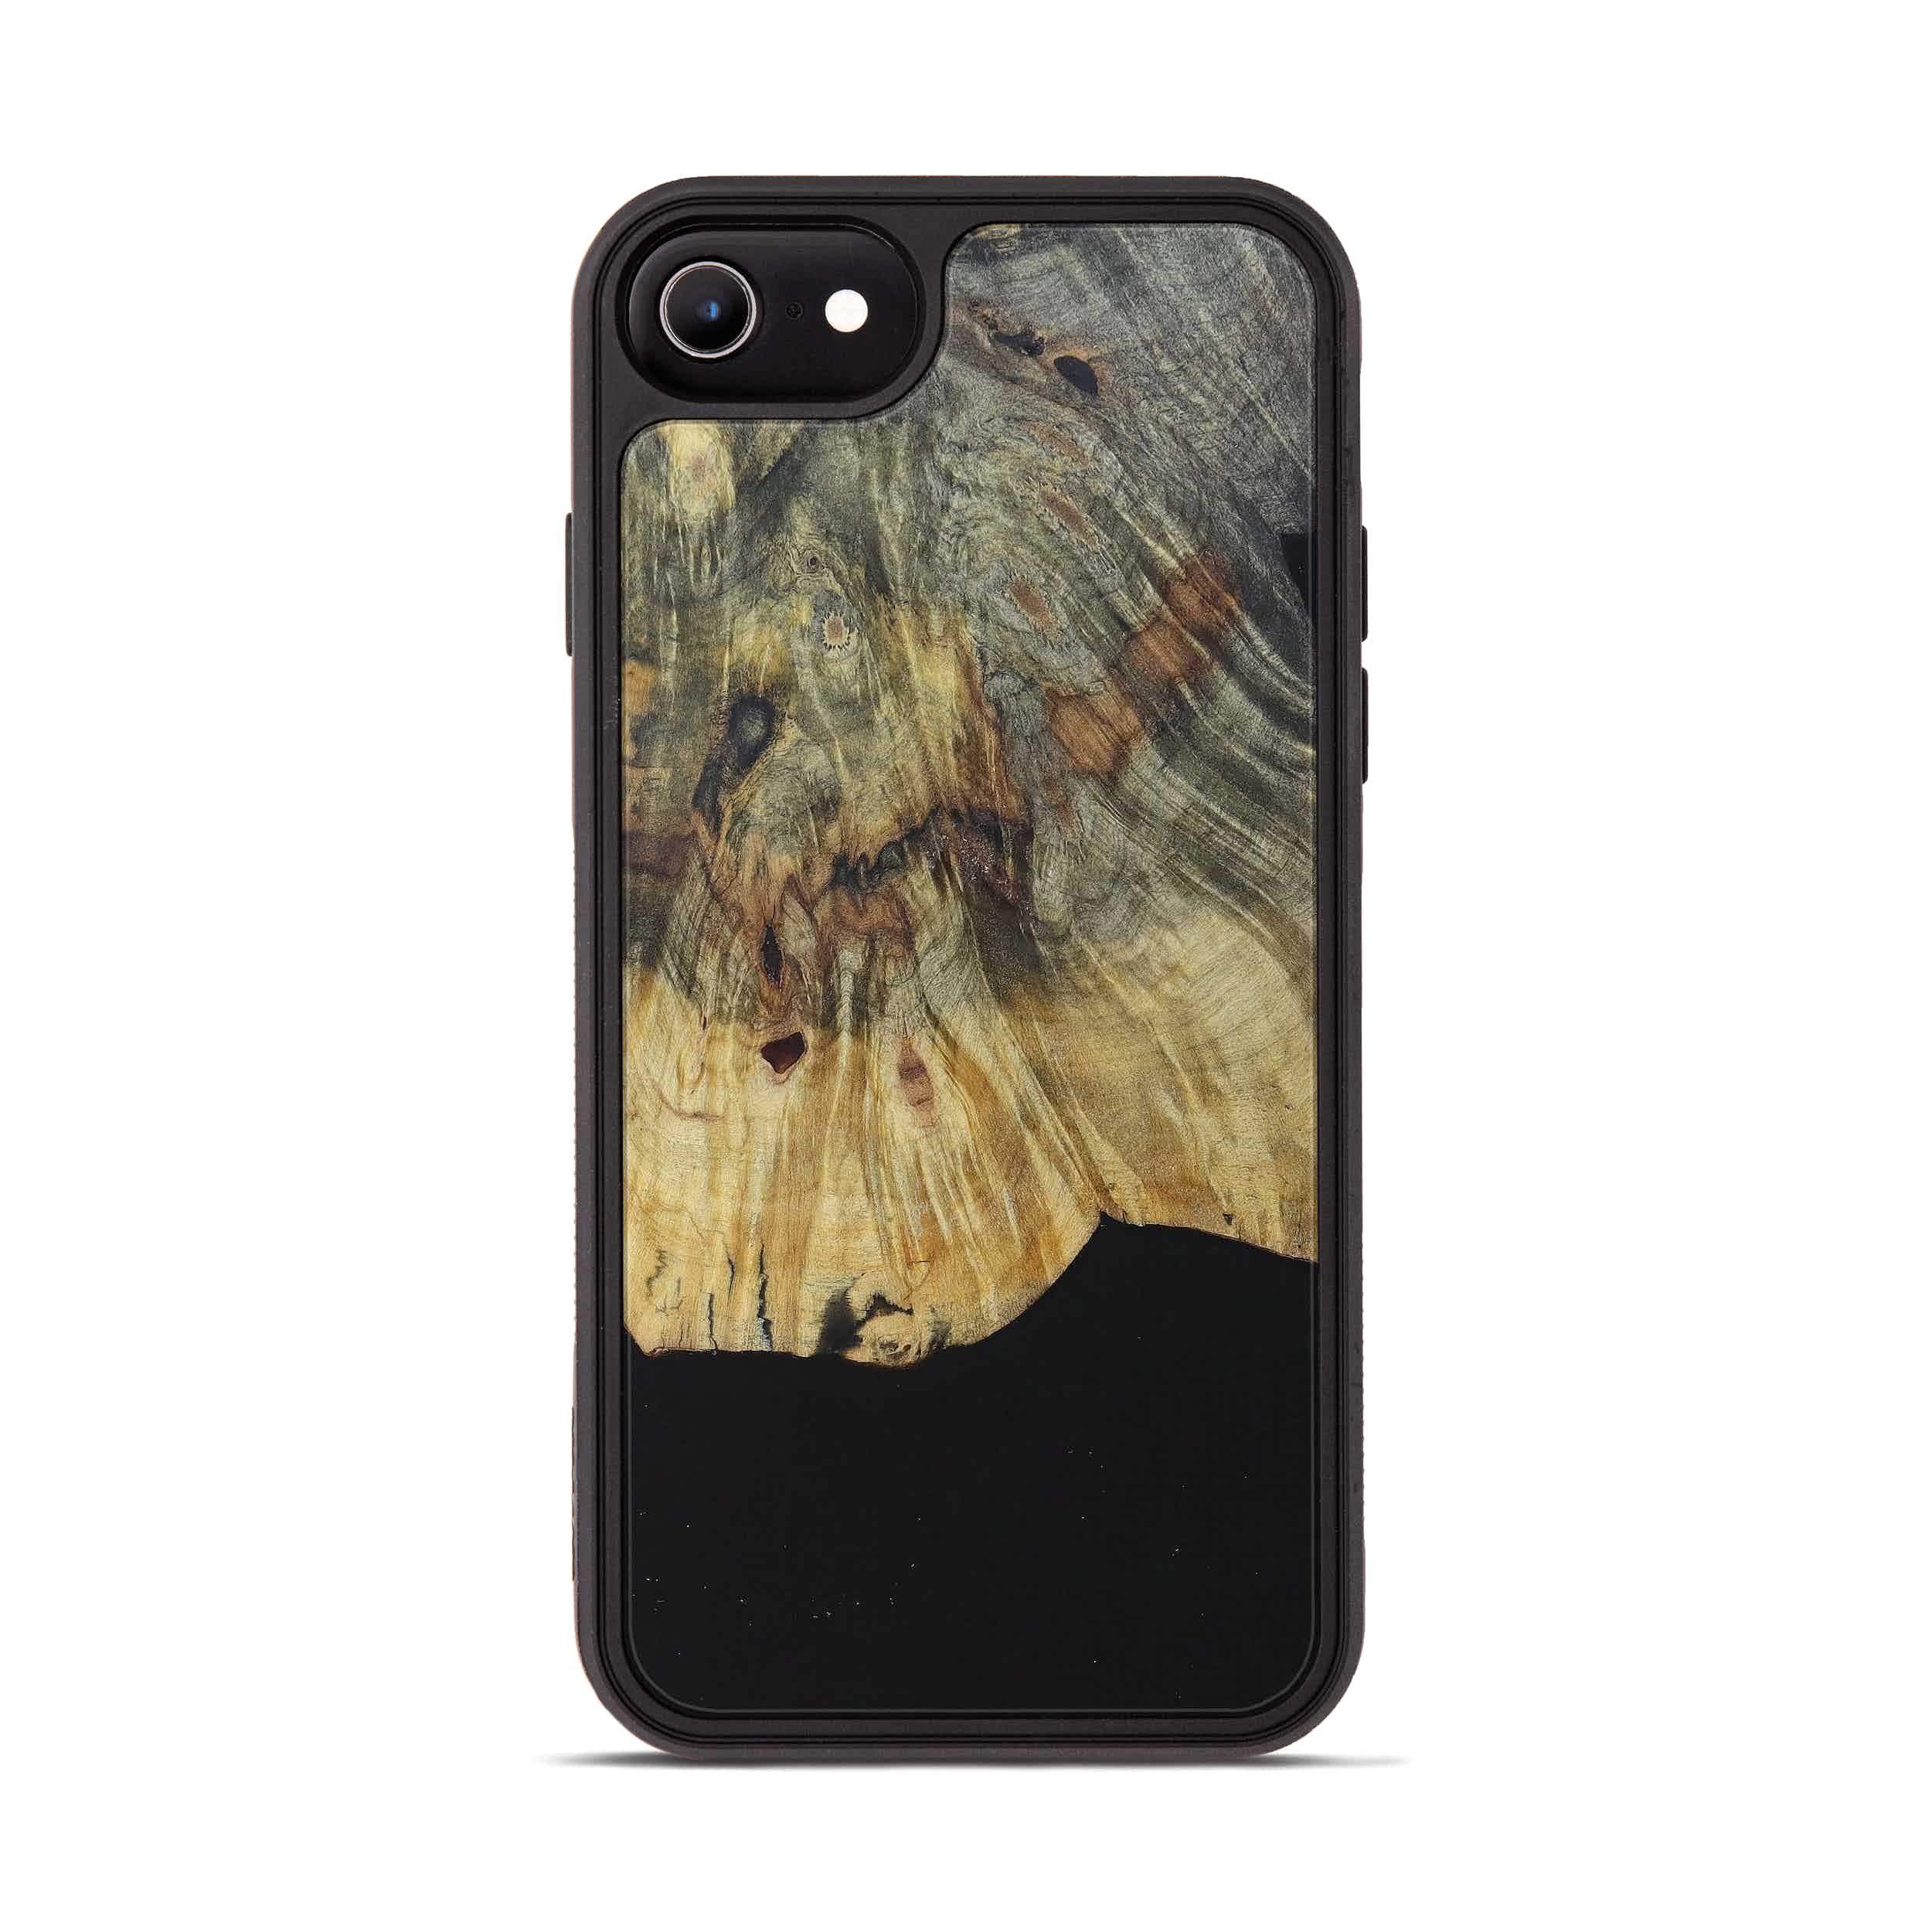 iPhone 8 Wood+Resin Phone Case - Meta (Pure Black, 394734)